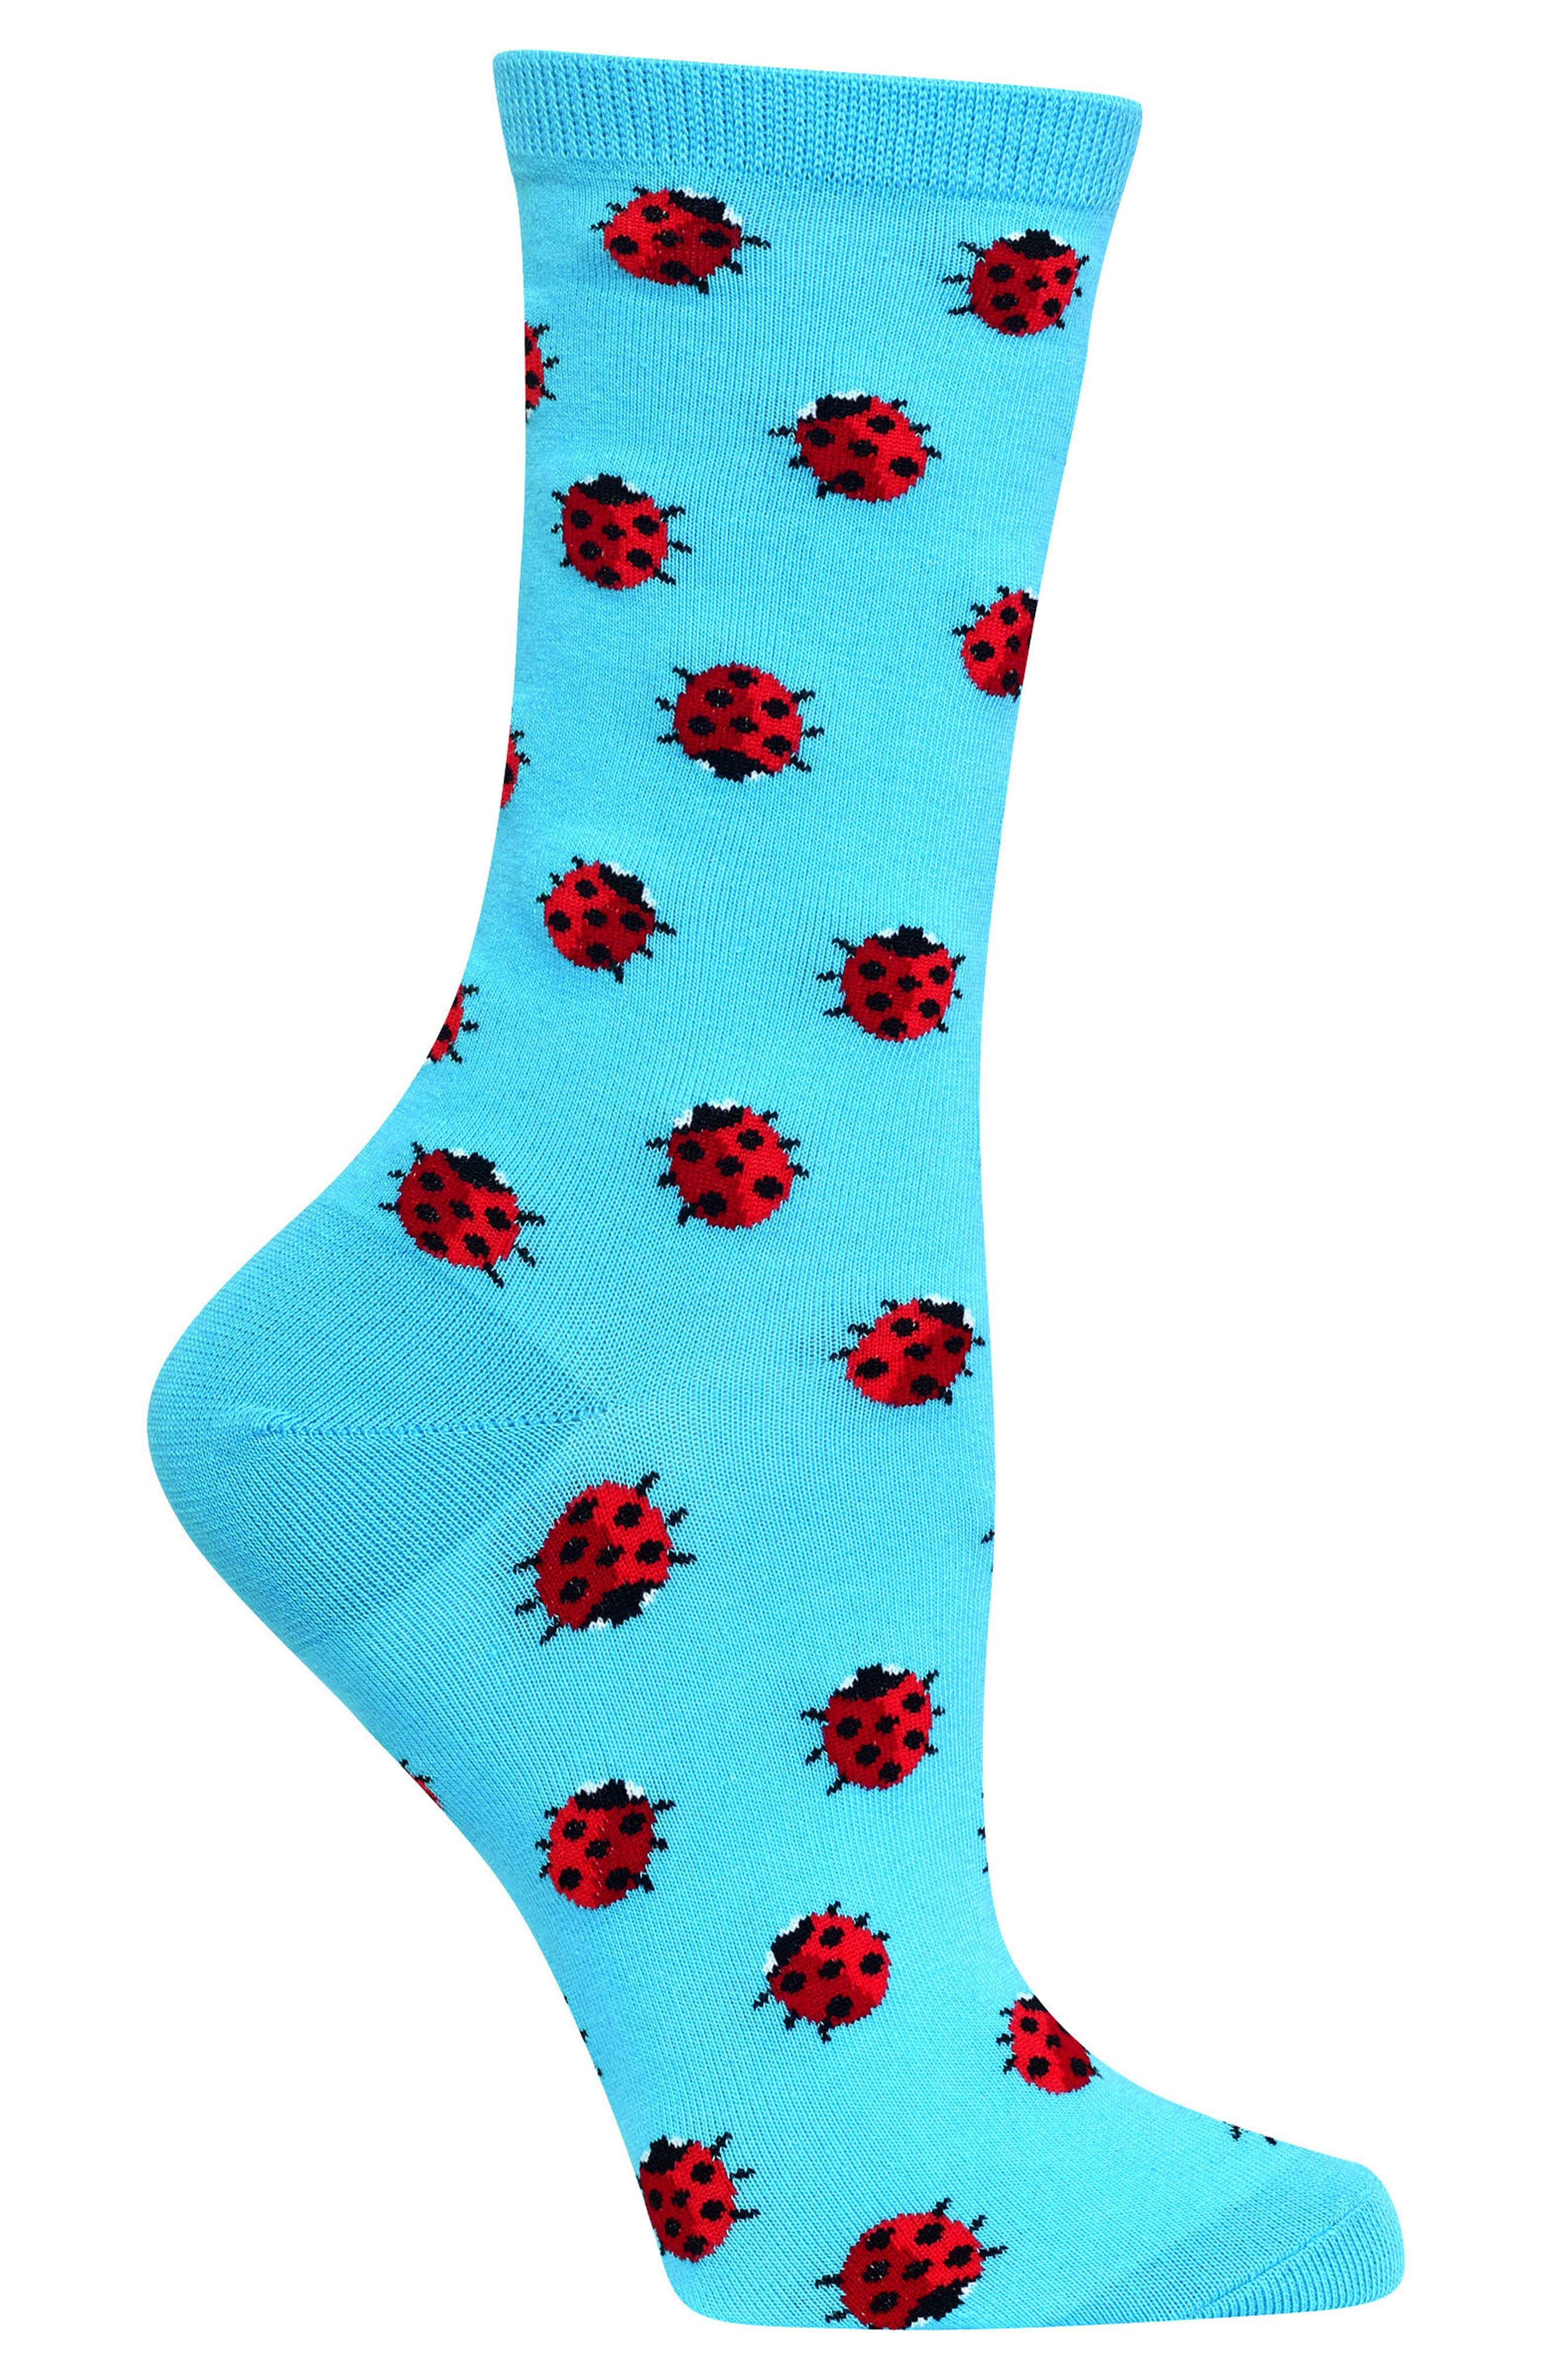 Ladybug Crew Socks,                             Alternate thumbnail 4, color,